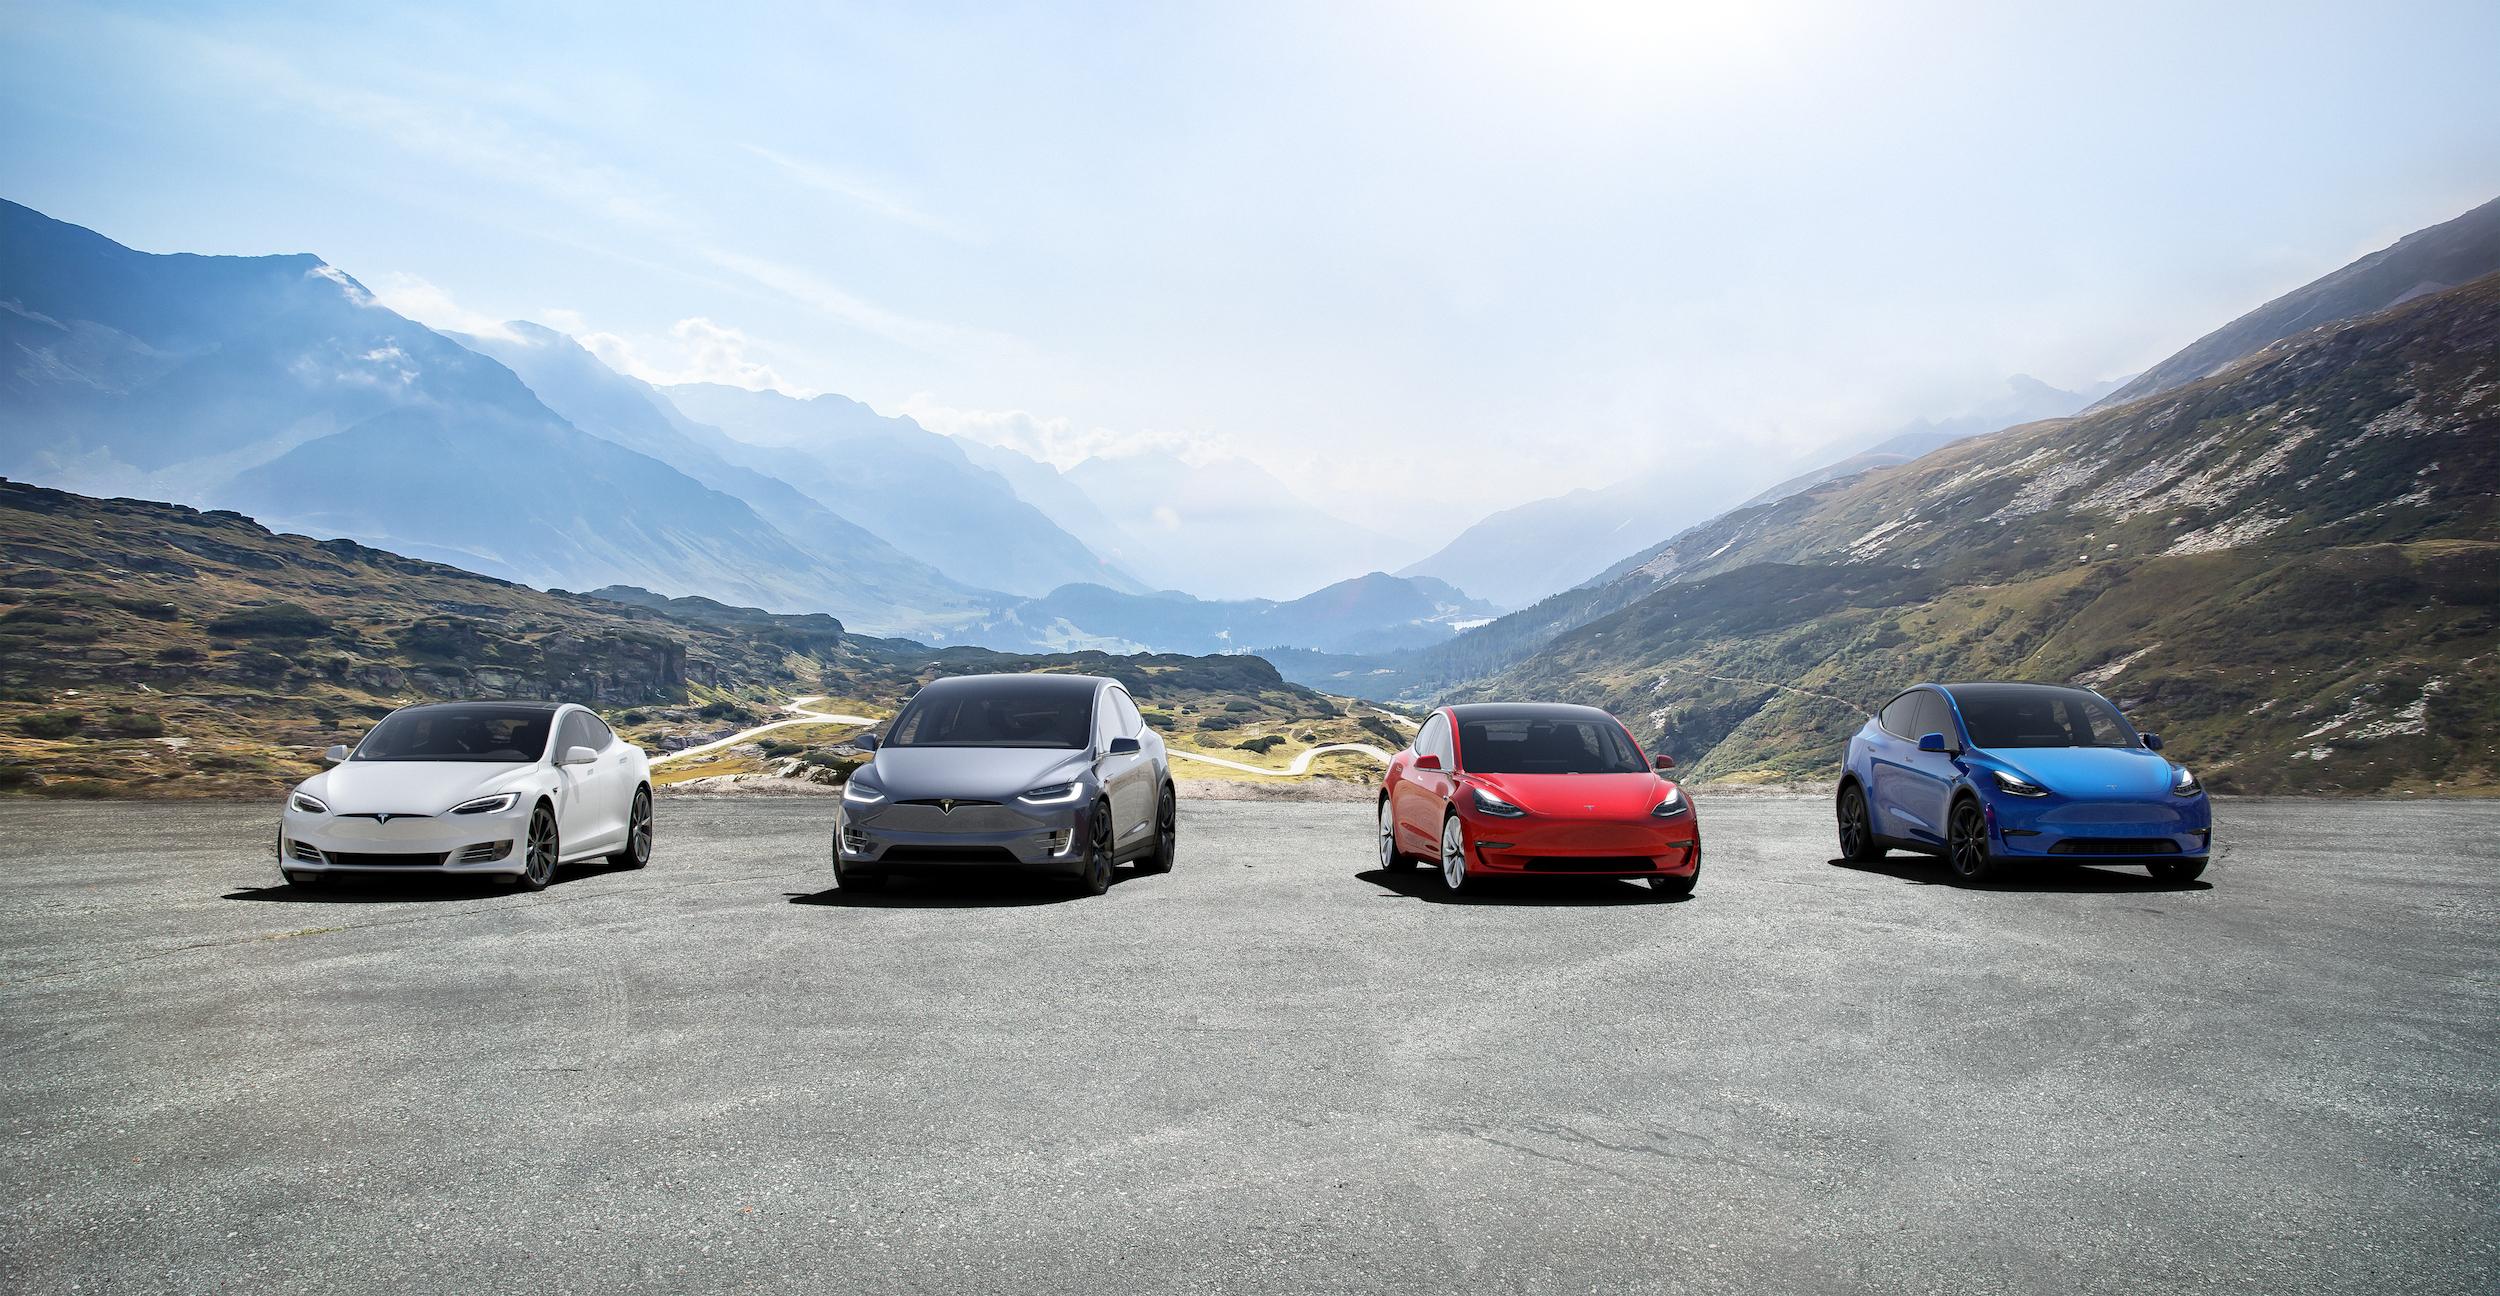 Tesla's Model S, 3, X, and Y